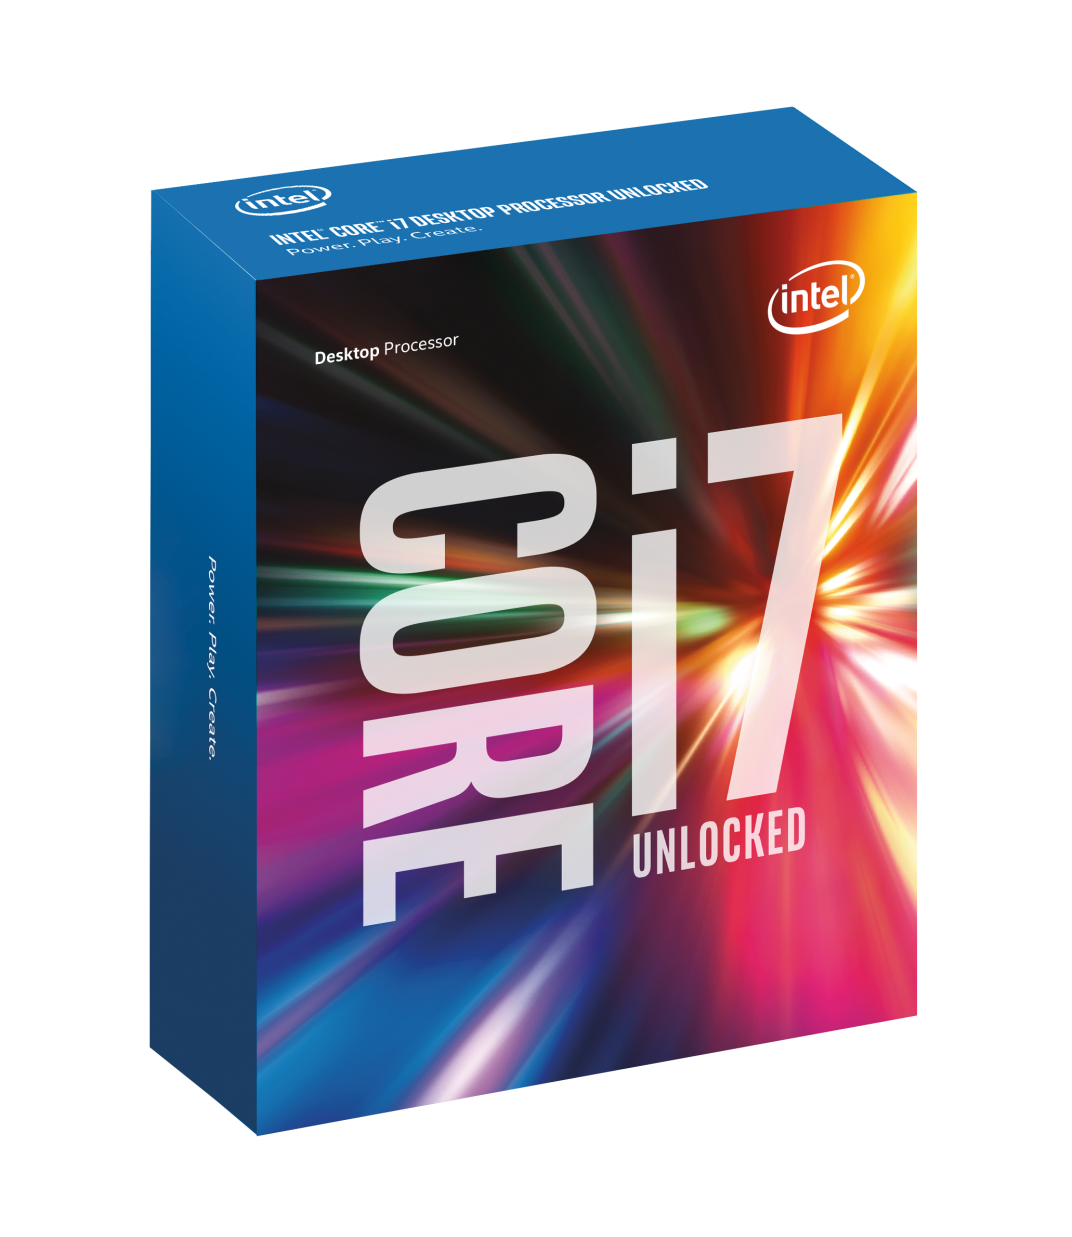 CPU INTEL Core i7-6700K (4.0GHz, 8M, LGA1151, VGA)